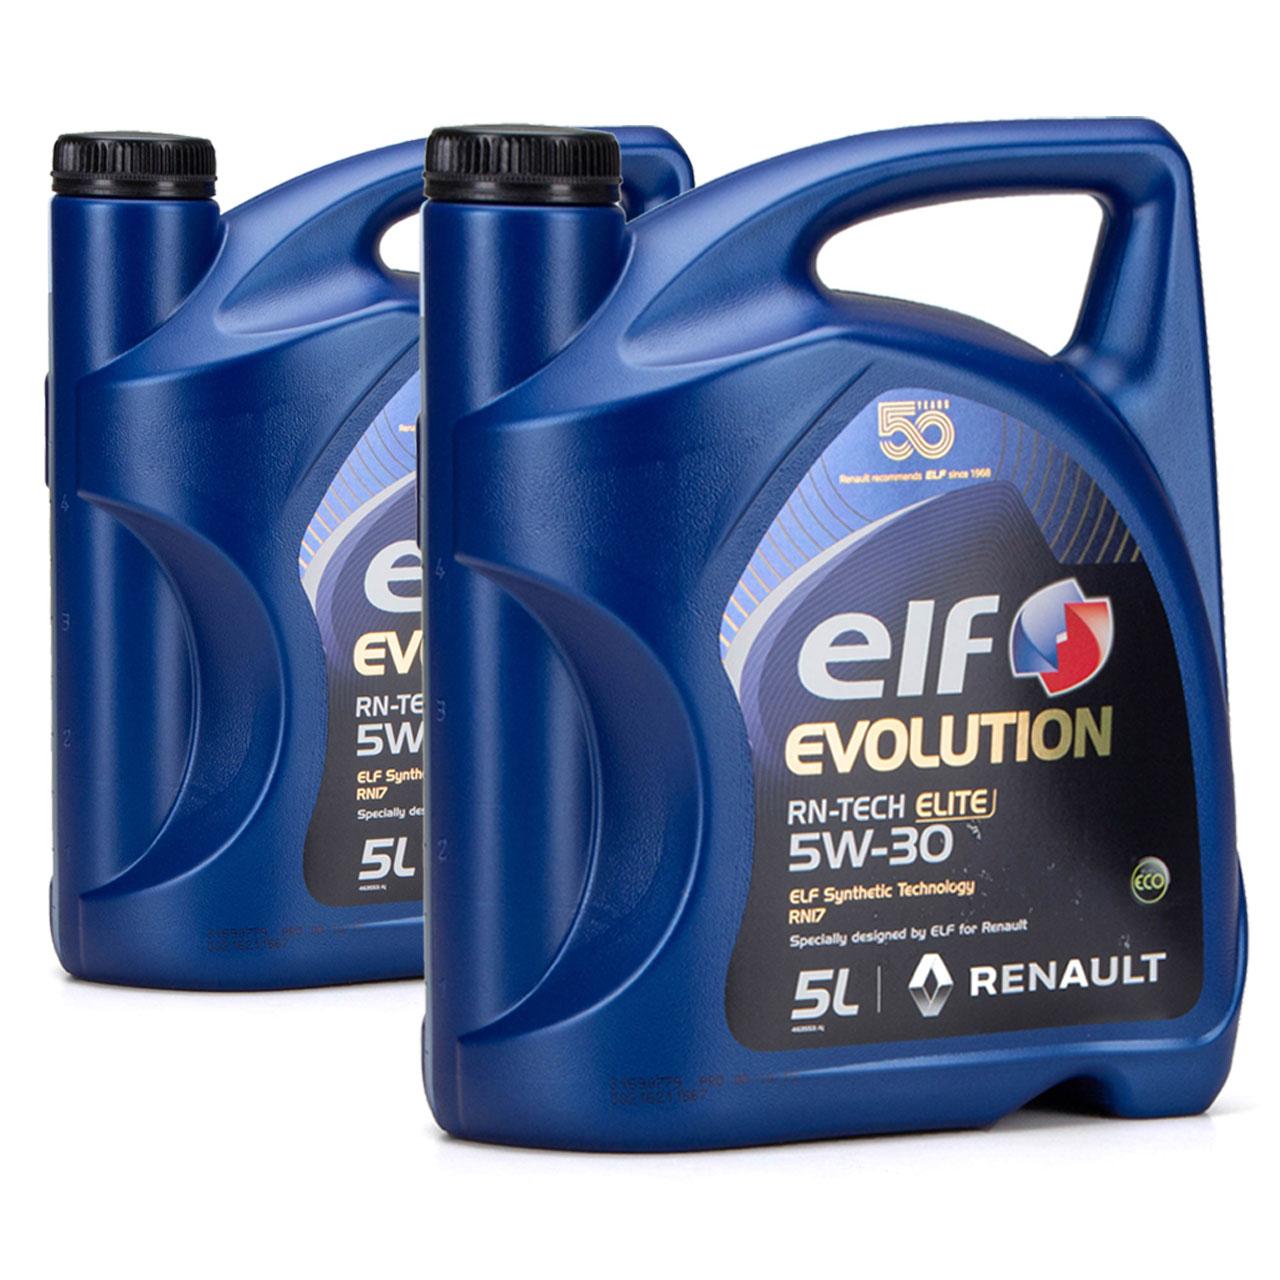 elf Evolution RN-TECH ELITE 5W-30 5W30 Motoröl Öl C3 Renault RN17 - 10L 10 Liter